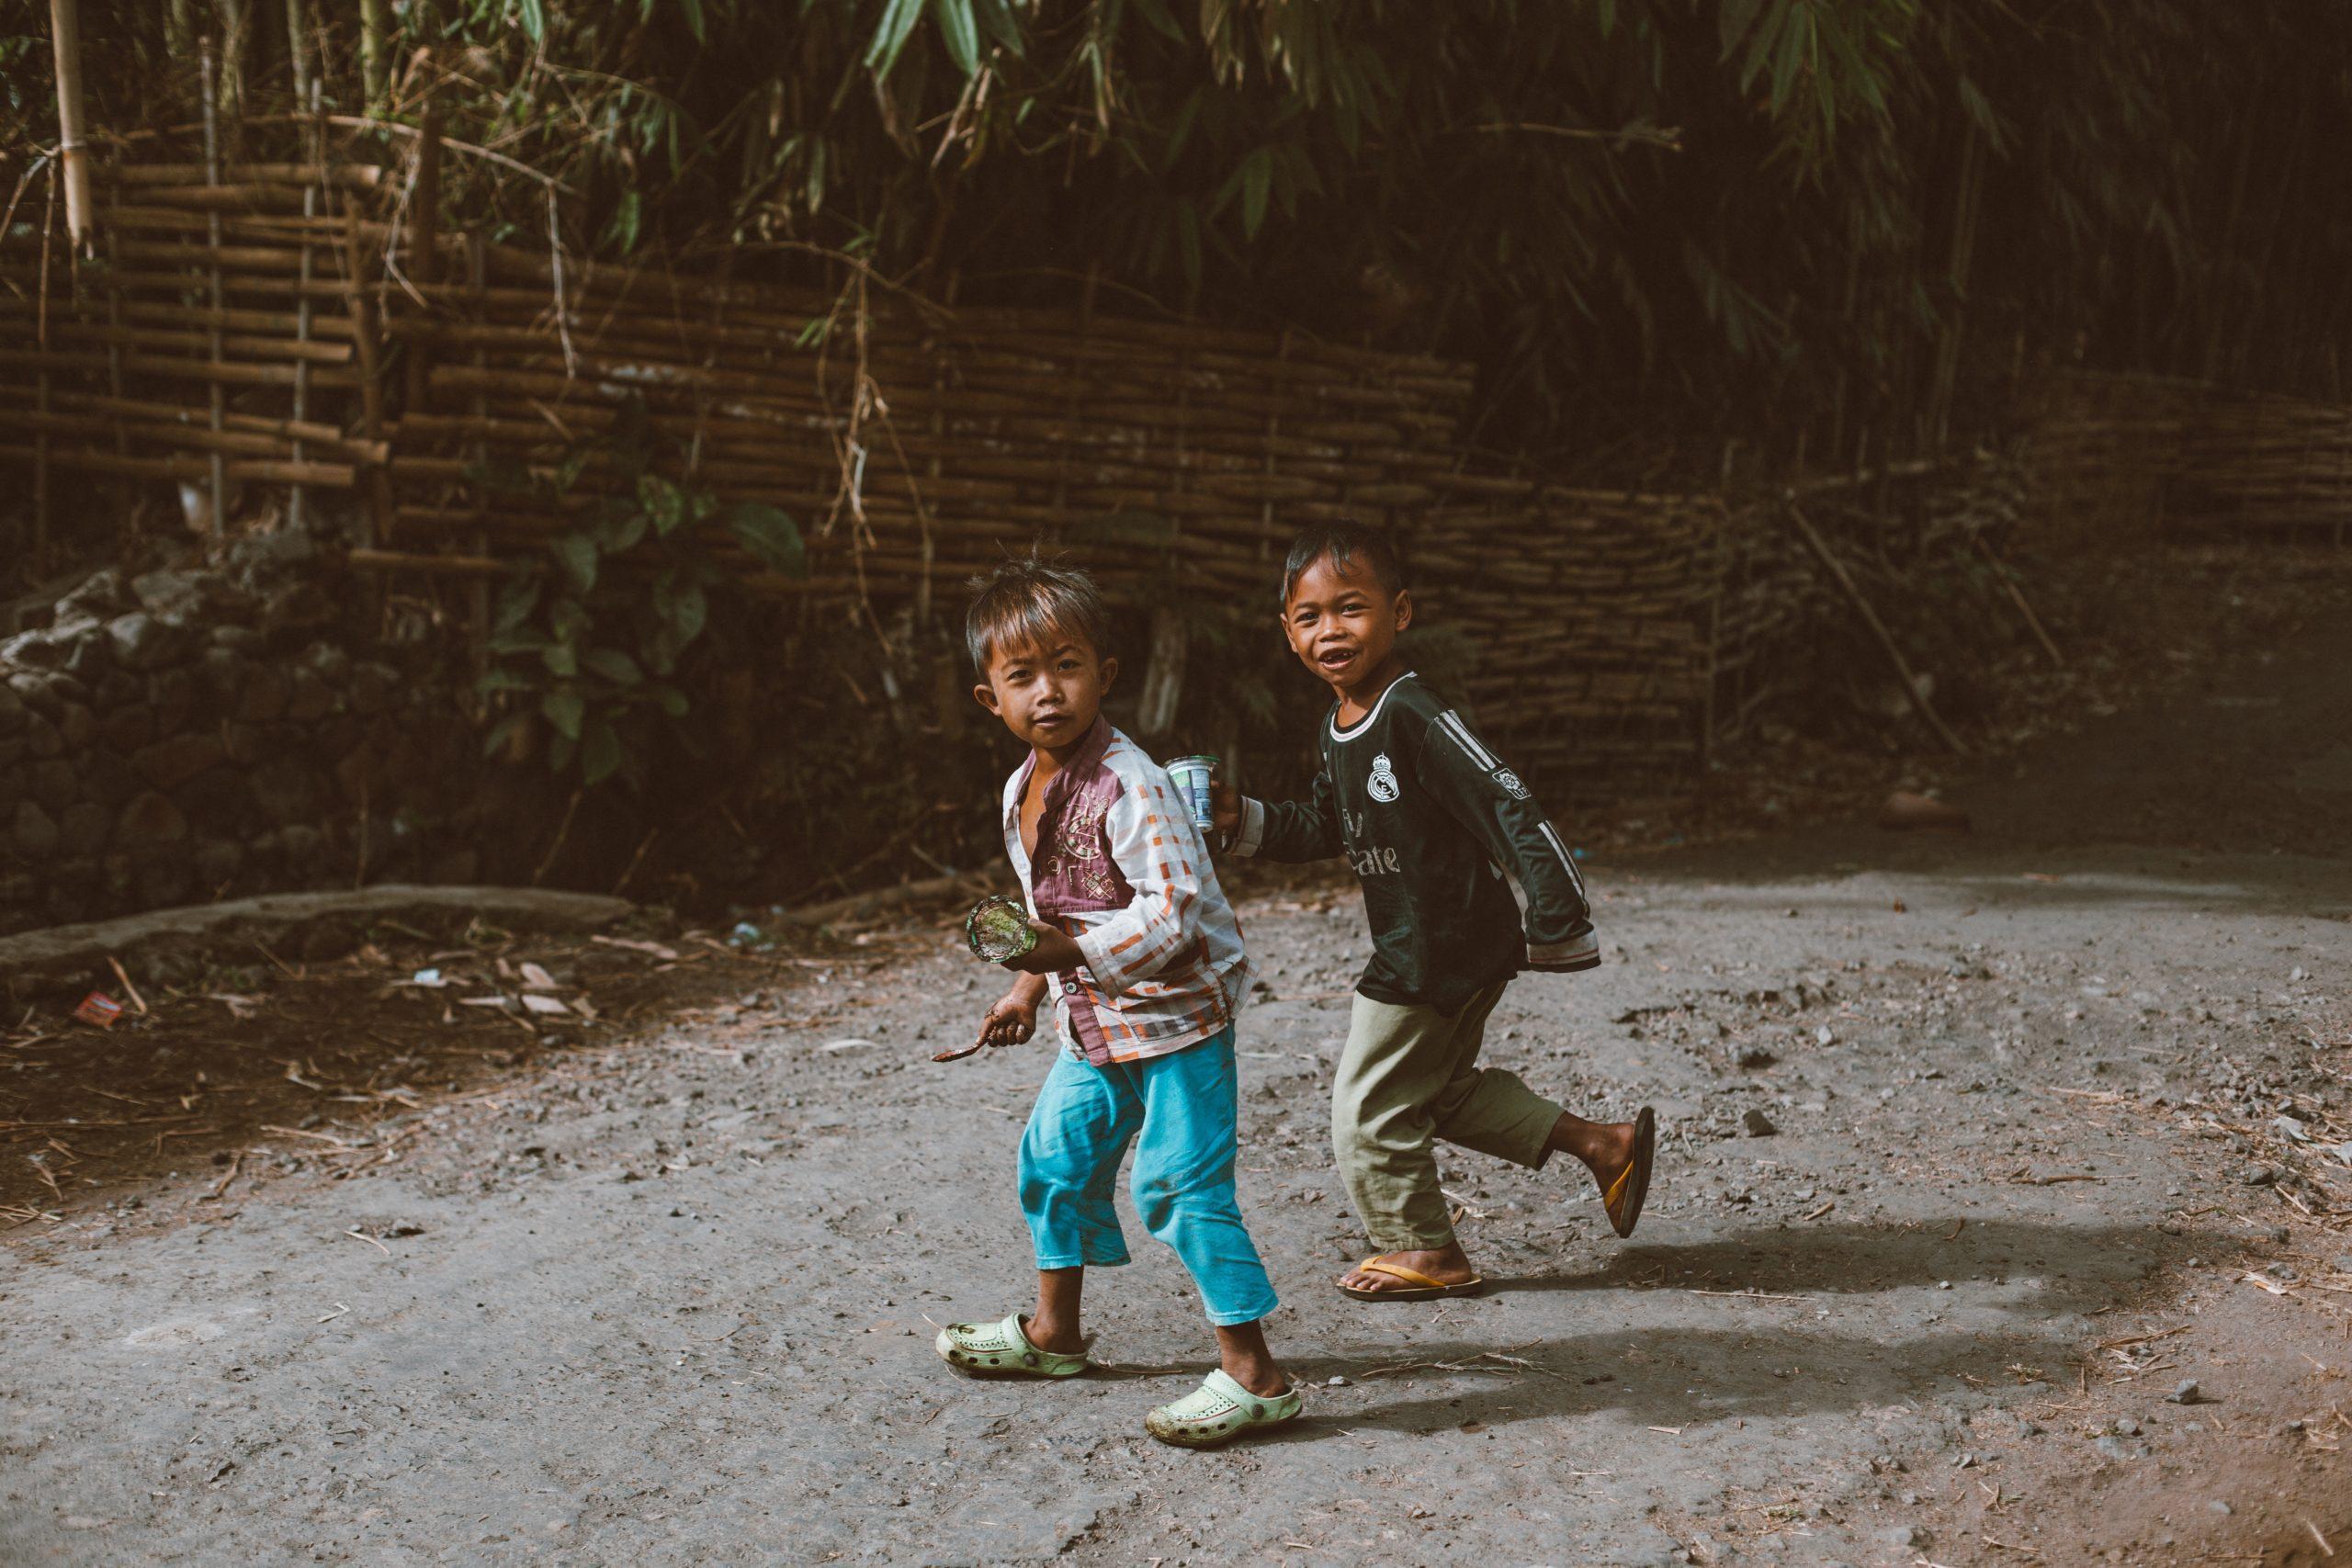 Street Children With Disabilities: Discrimination